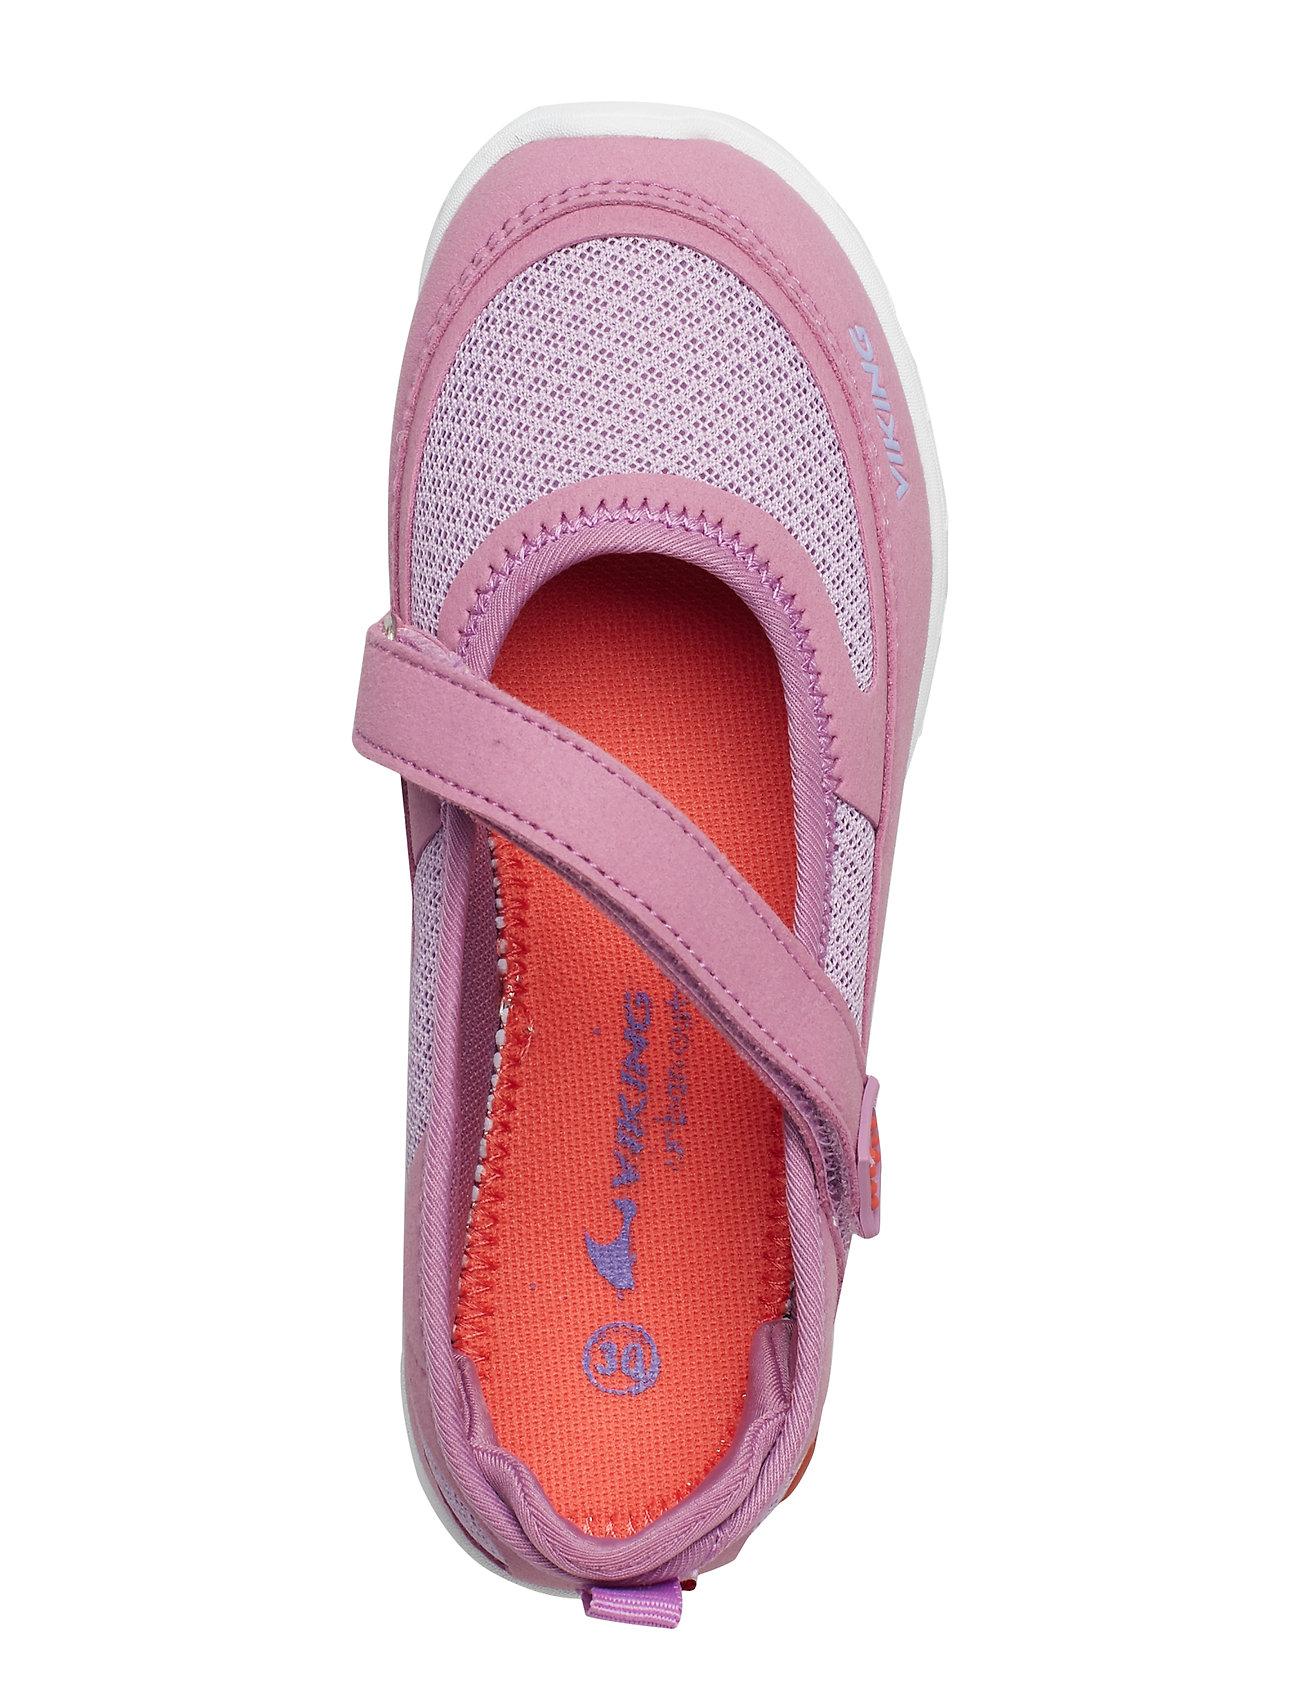 Viking Fana Mj - Ballerinaskor & Slip-ons Lavender/coral